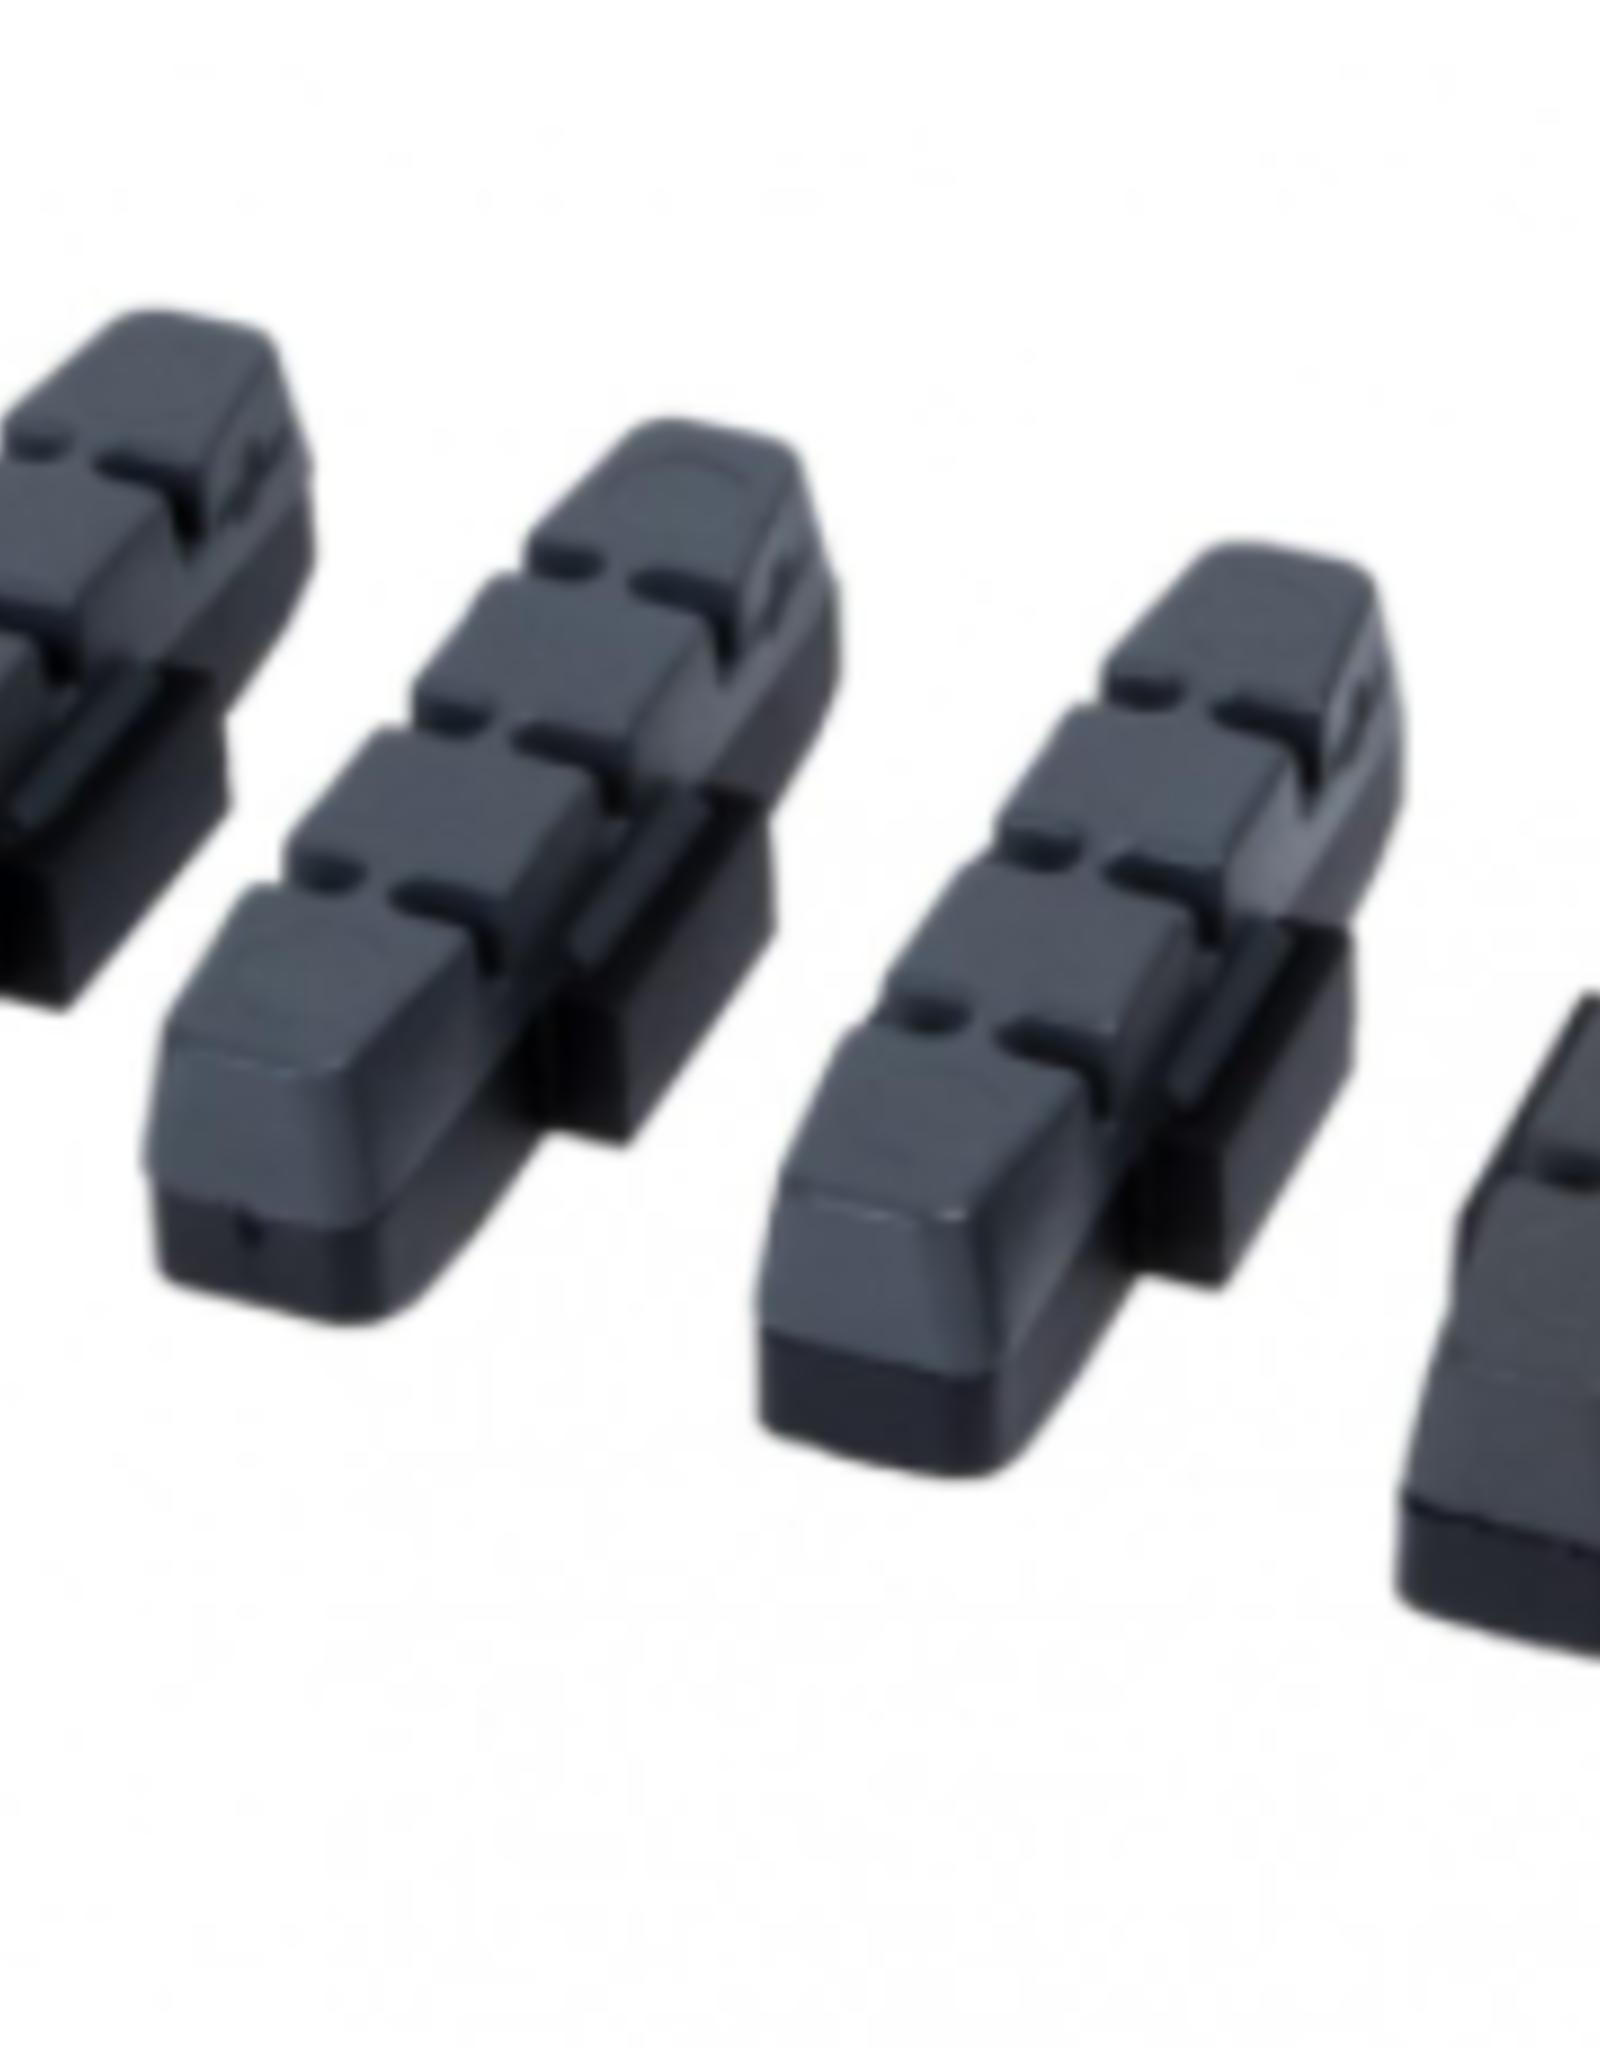 Magura Magura Brake Pads, Grey, Hard Anodised and Ceramic Rims